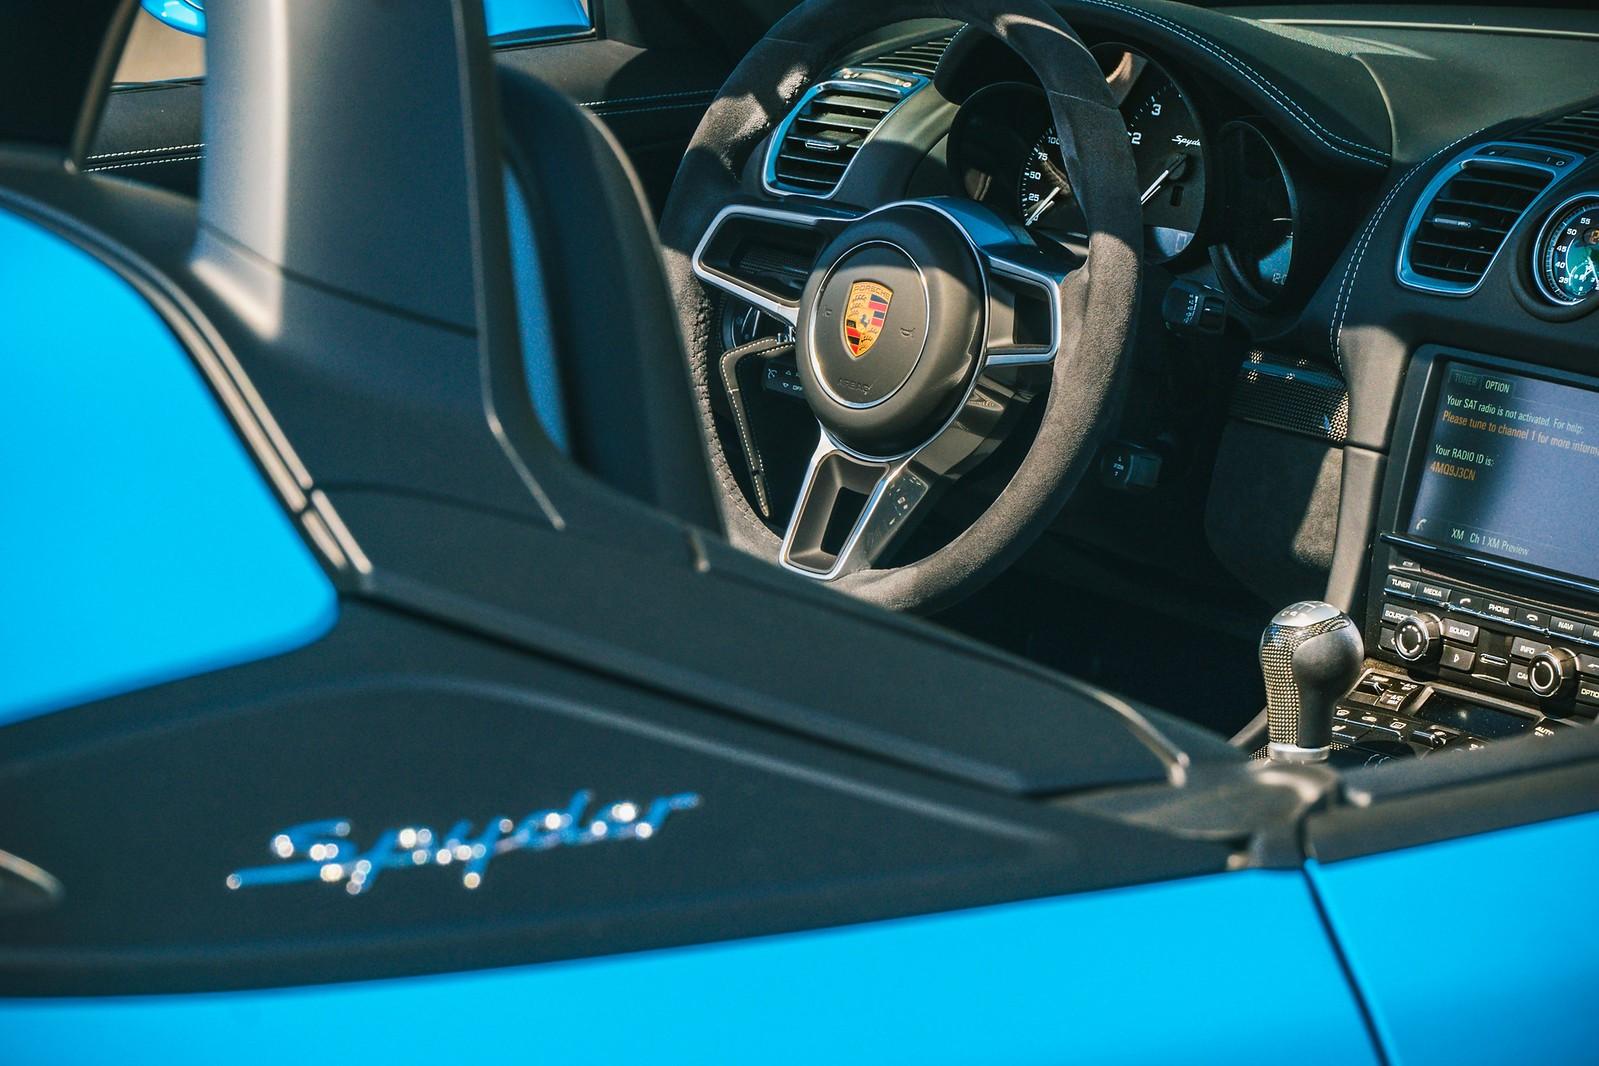 2016 Porsche 981 Boxster SpyderSOLD Exotic Car Search